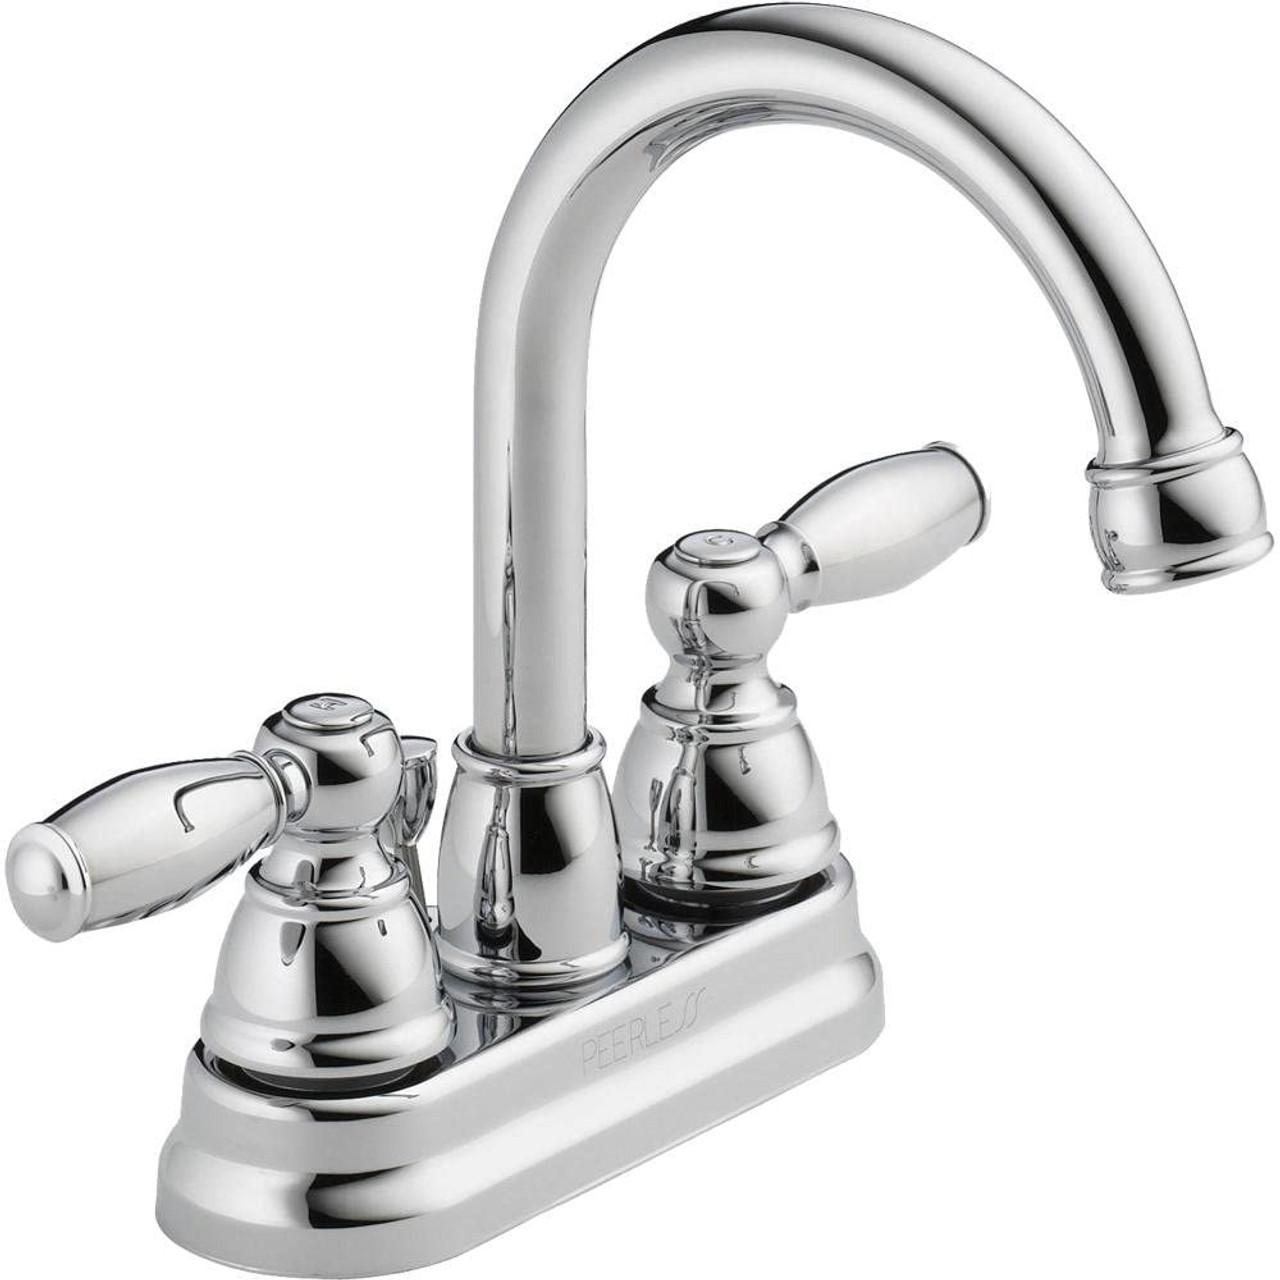 Peerless P299685LF Claymore 2-Handle Centerset Bath Sink Faucet Chrome